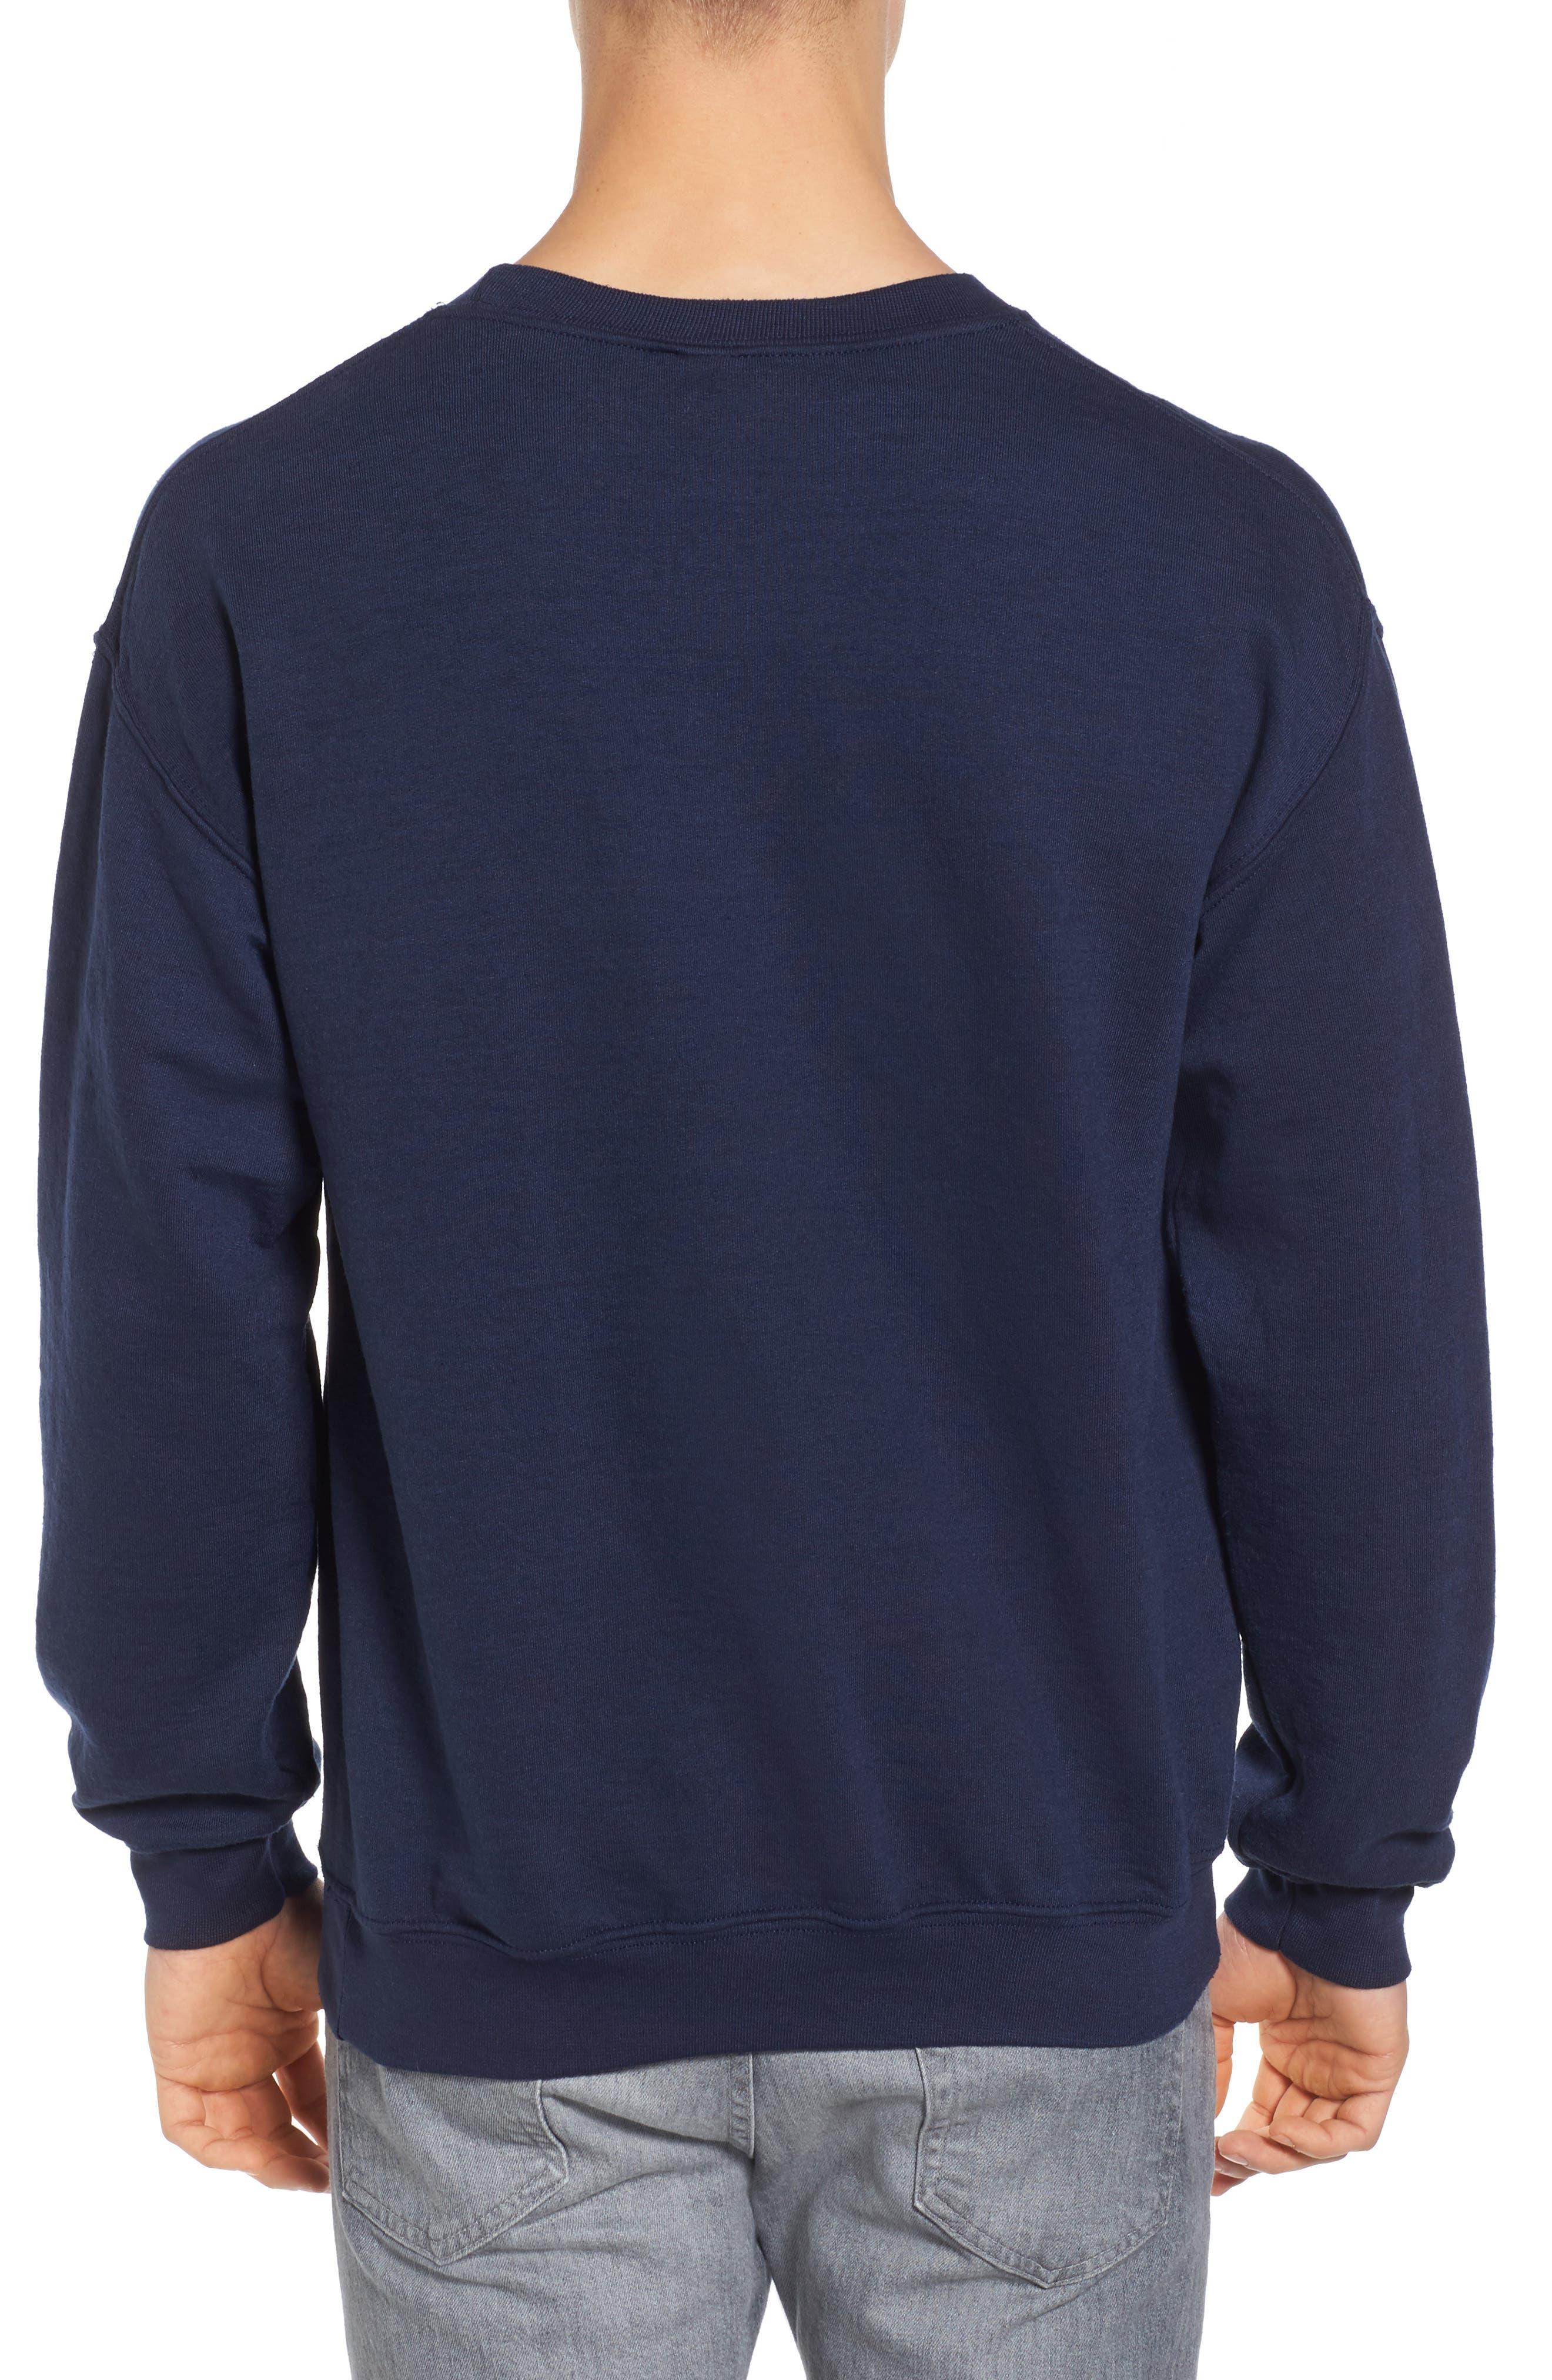 Natural Mushroom Sweatshirt,                             Alternate thumbnail 2, color,                             Blue